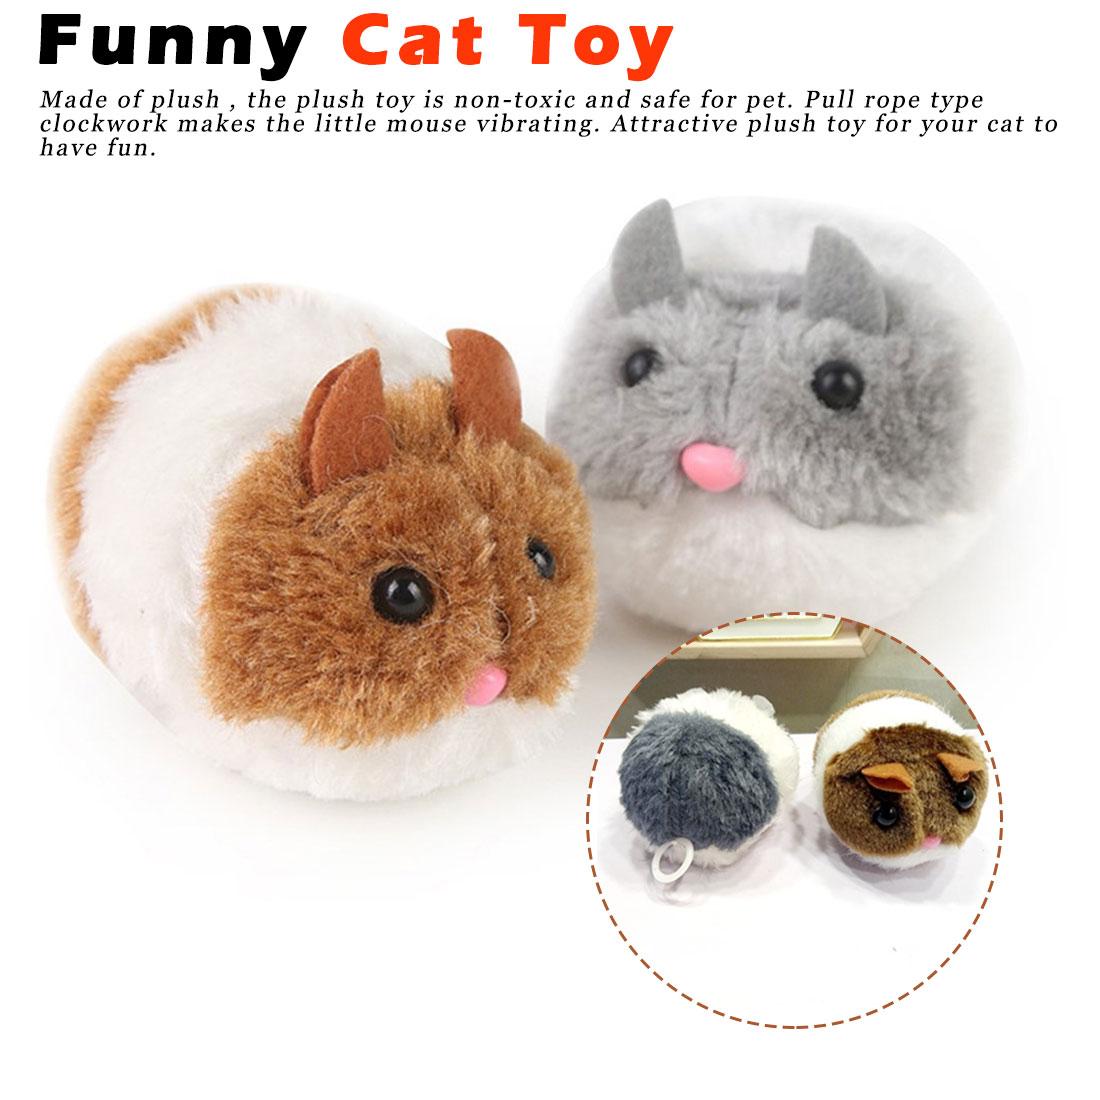 1PC Cute Cat Toy Plush Fur Toy Shake Movement Mouse Pet Funny Movement Rat Little interactive bite toy